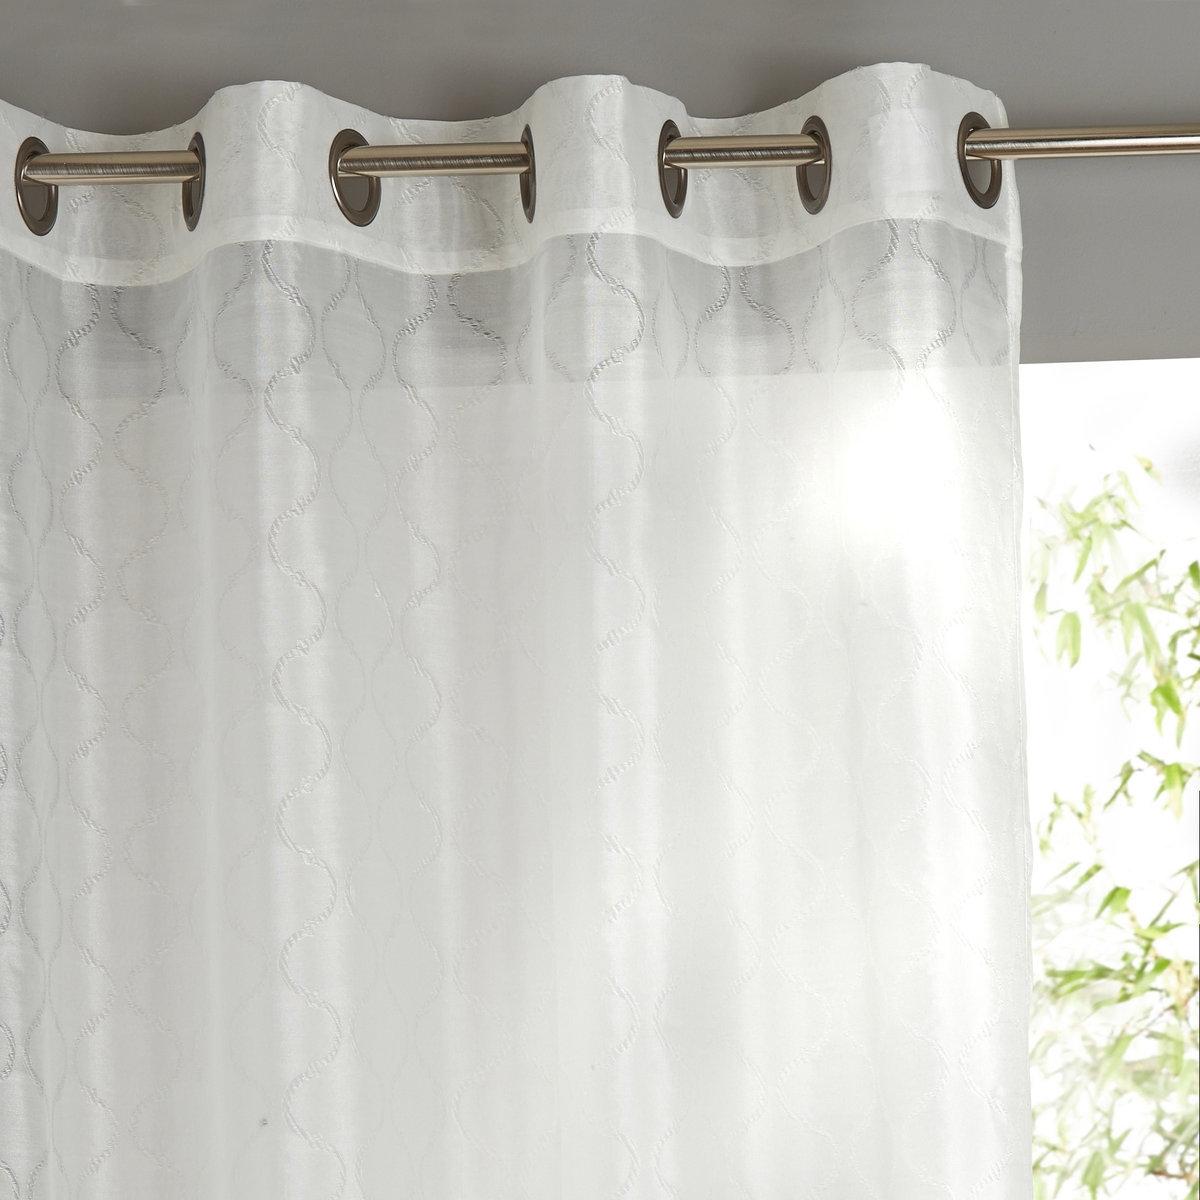 Занавеска из жаккардовой ткани с люверсами, ZIMBA от La Redoute